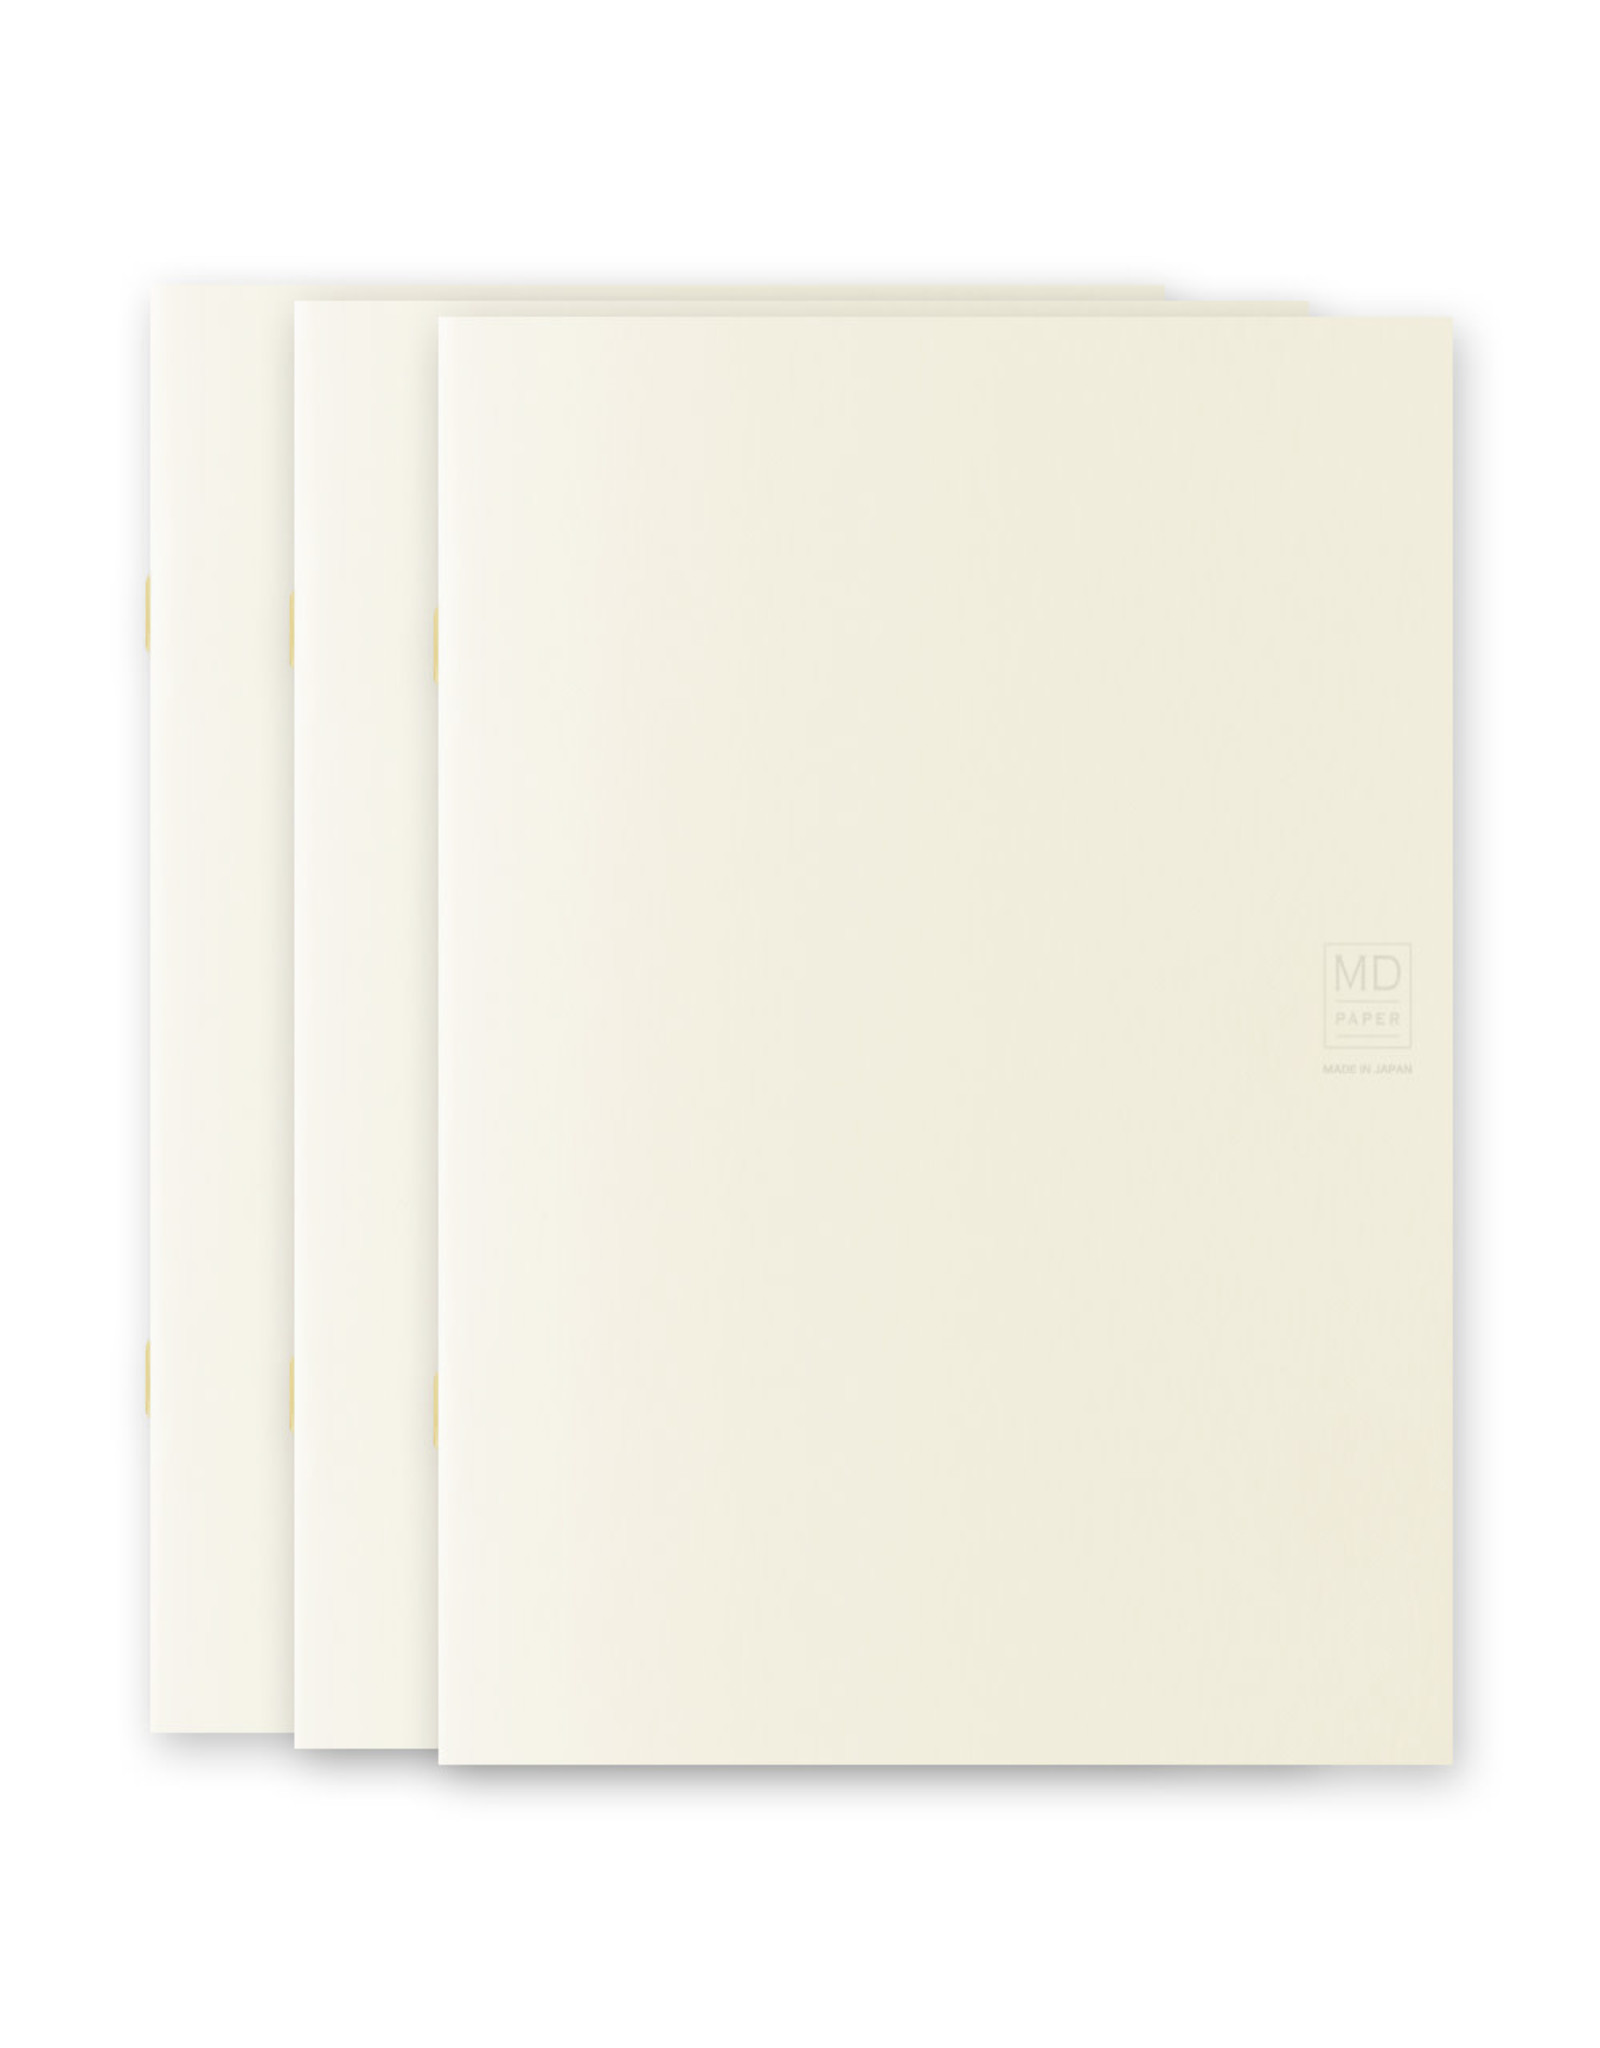 Designphil Inc. MD NOTEBOOK LIGHT  BLANK 3PCS PACK ENGLISH CAPTION